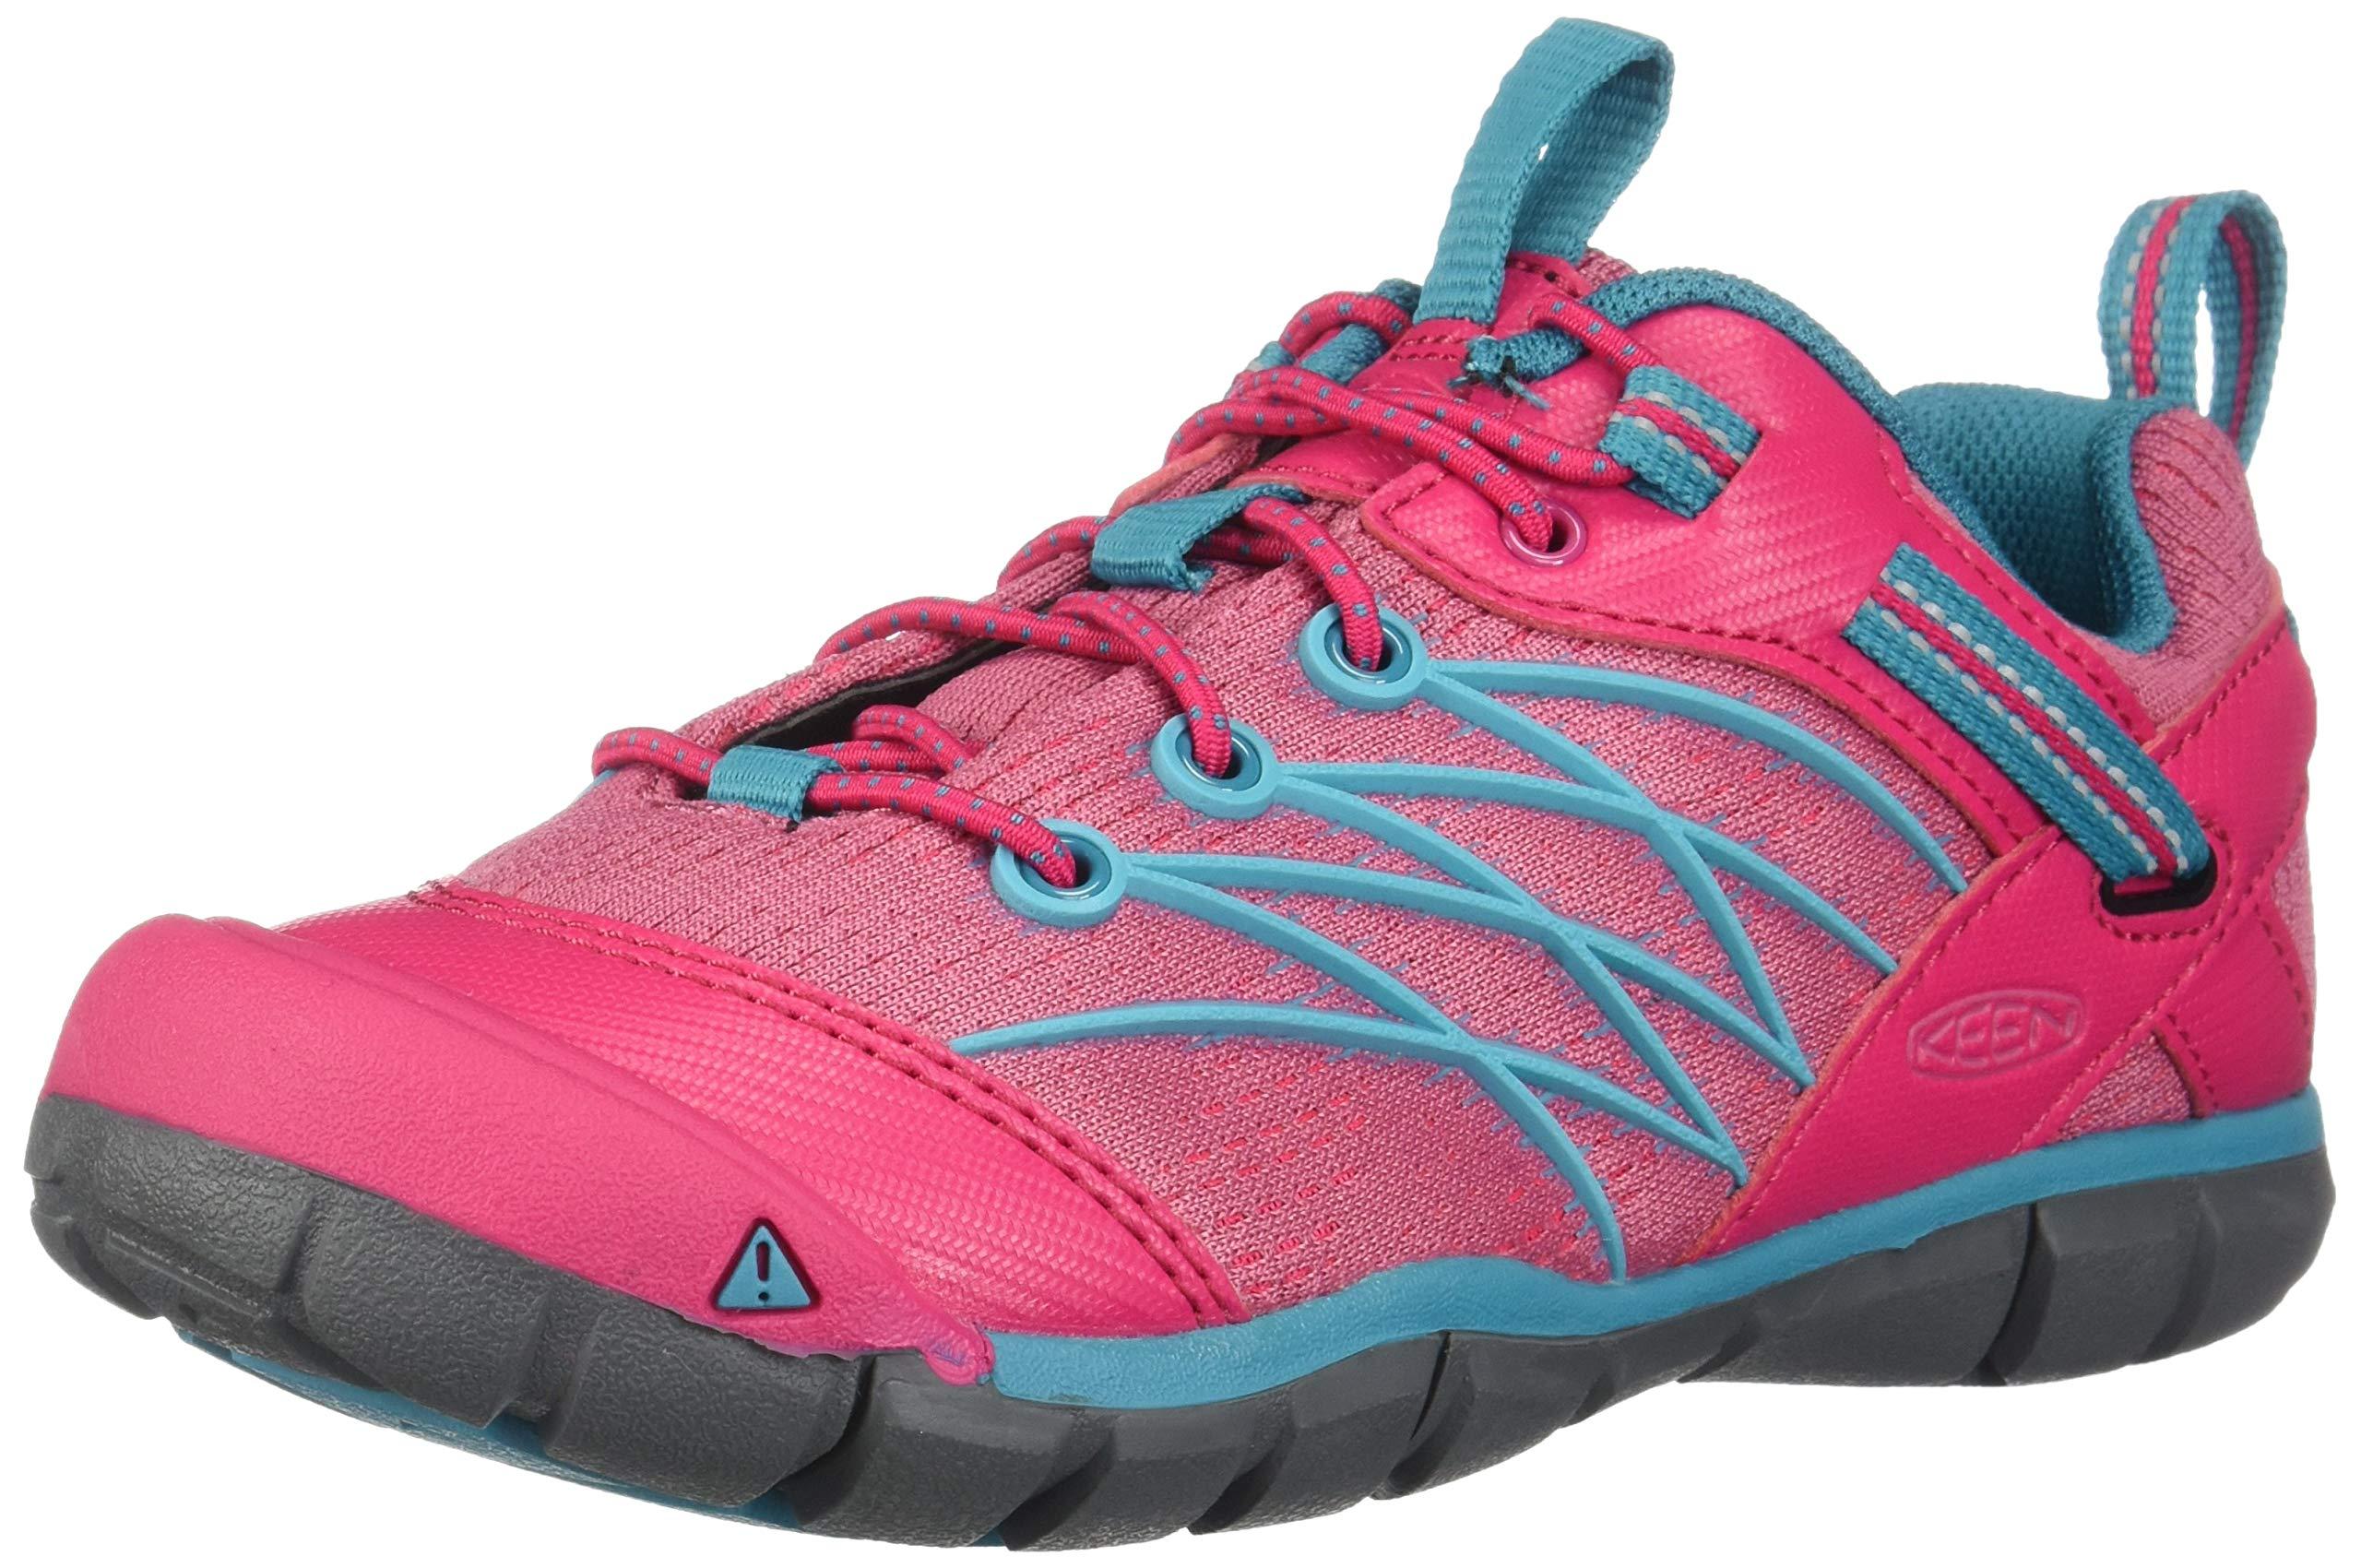 KEEN Unisex Chandler CNX Hiking Shoe, Bright Pink/Lake Green, 3 M US Big Kid